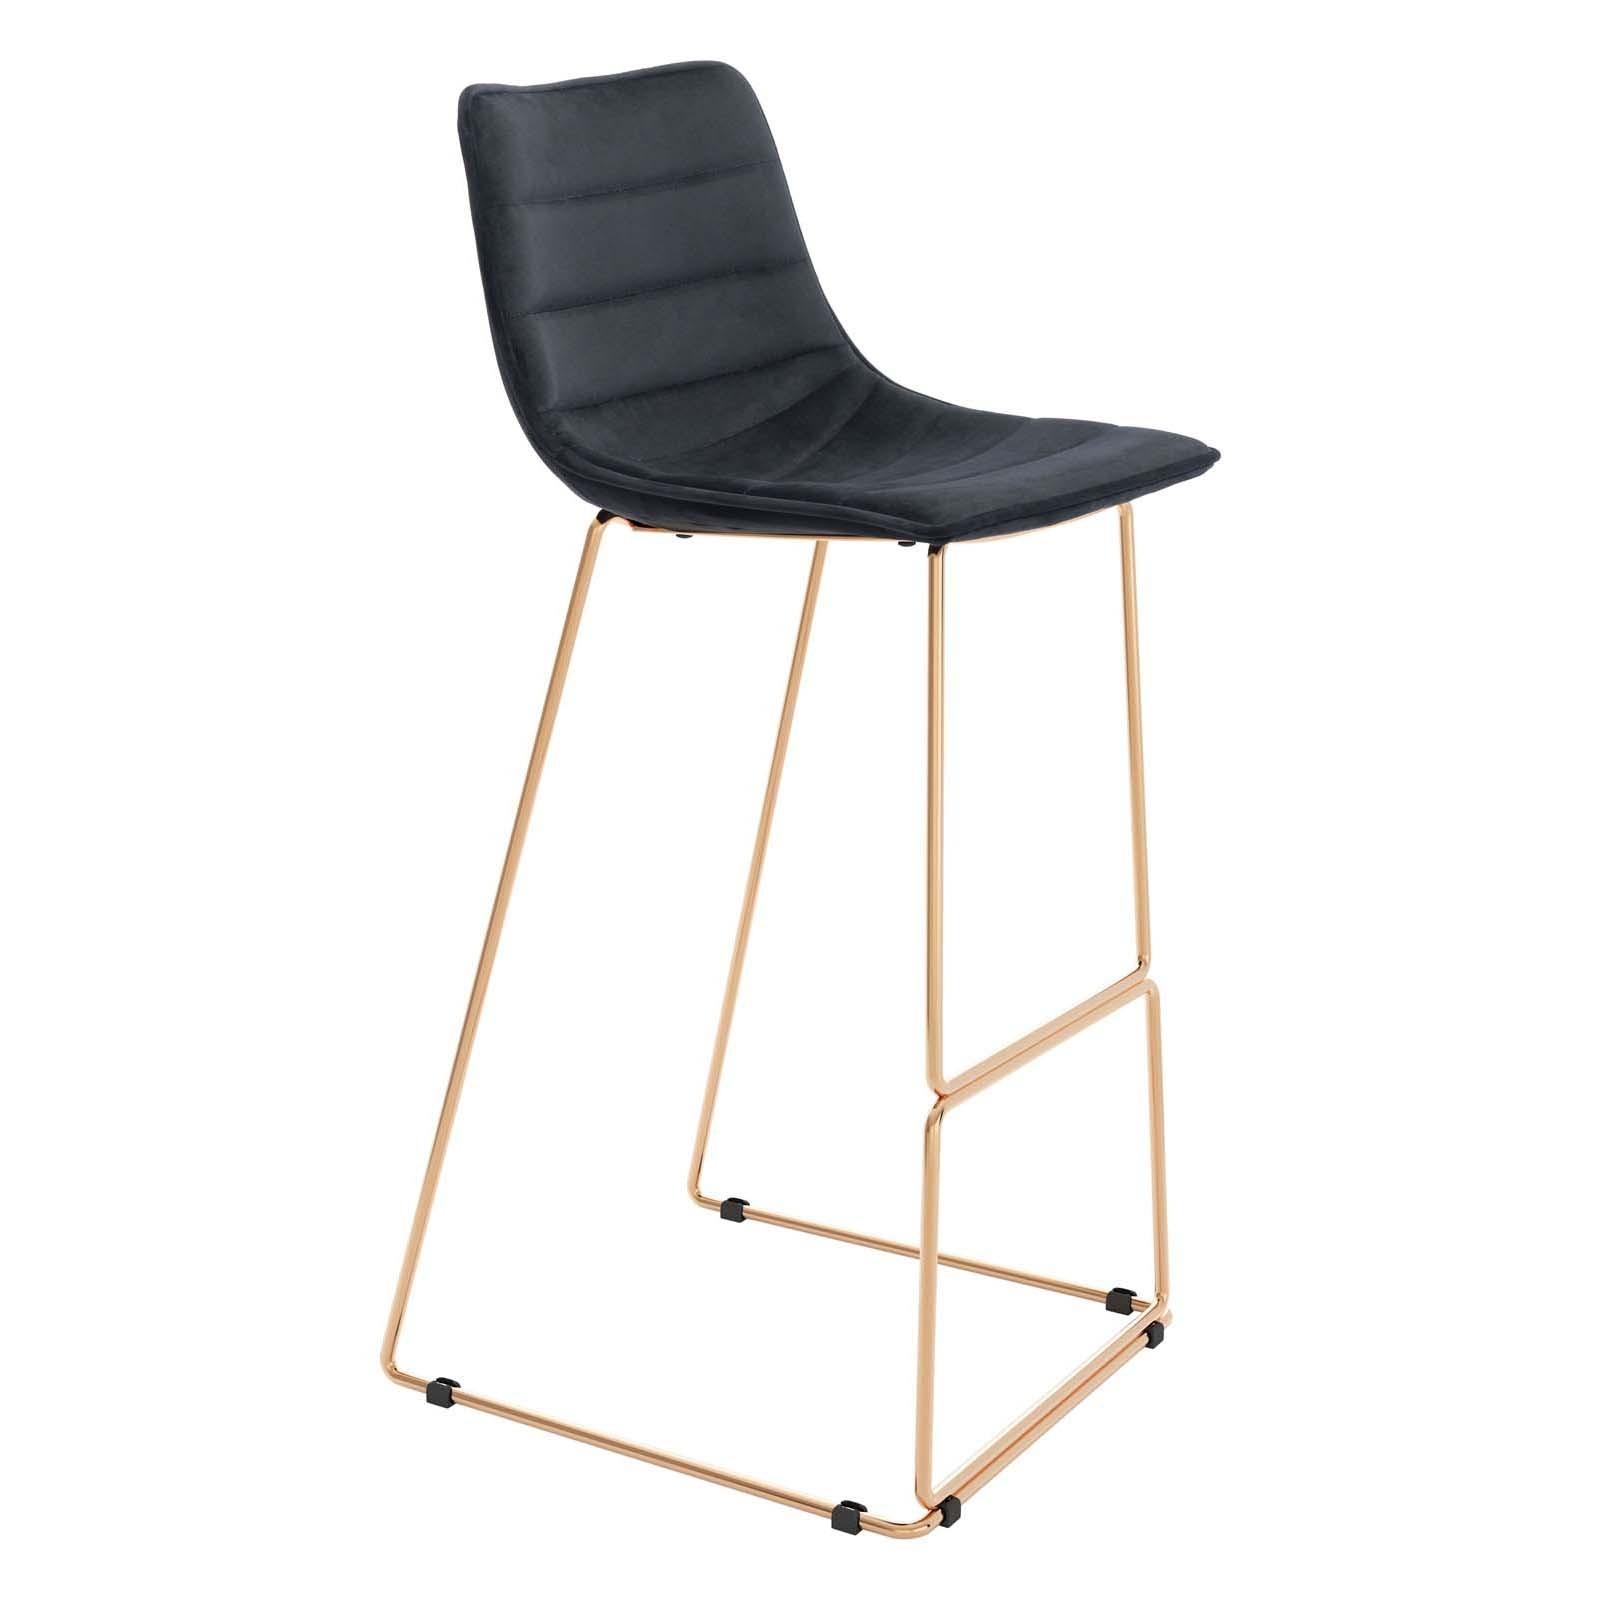 Adele Bar Chair